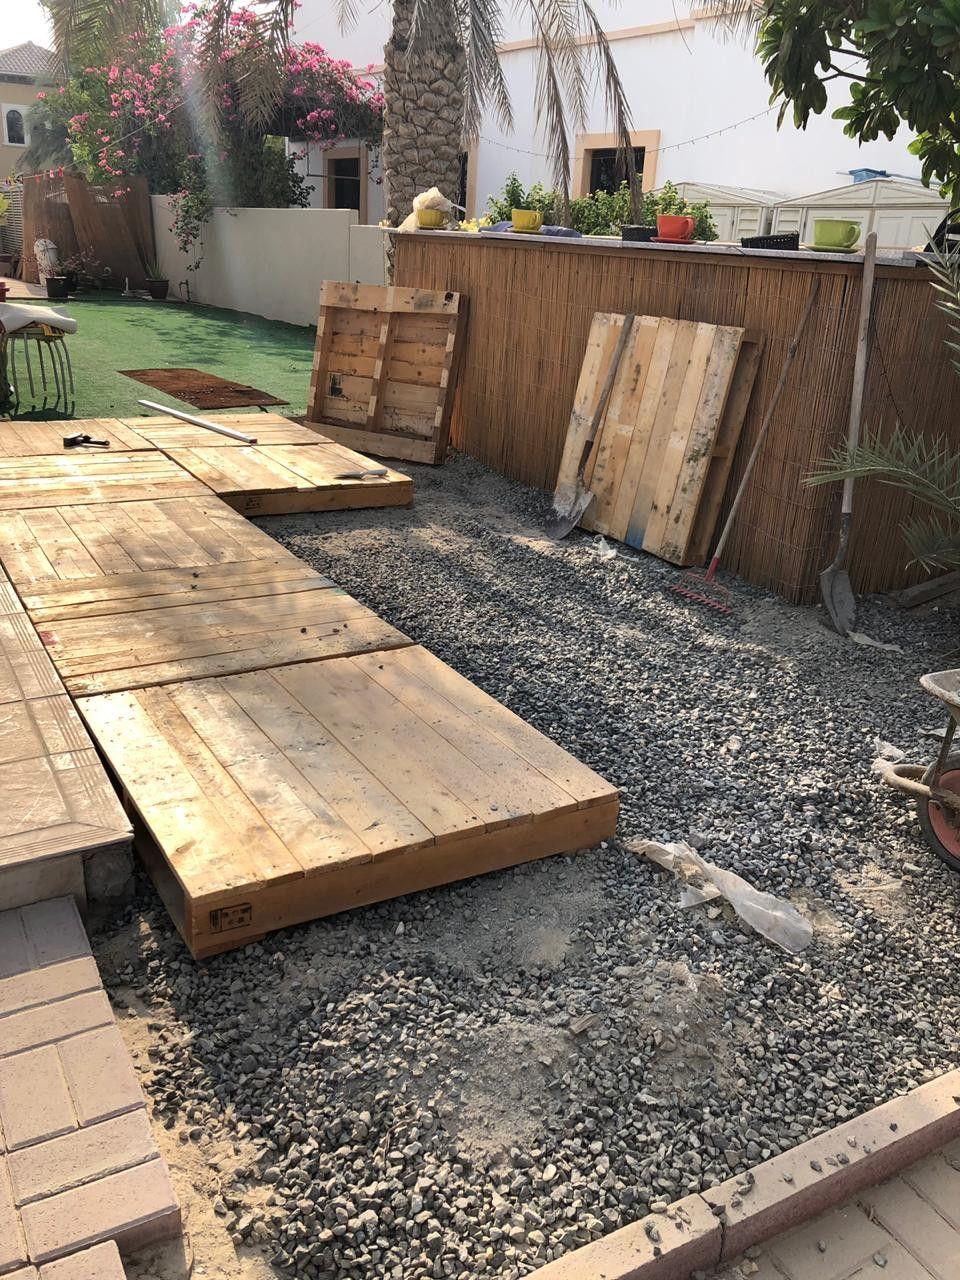 Wooden Pallets 0555450341 27